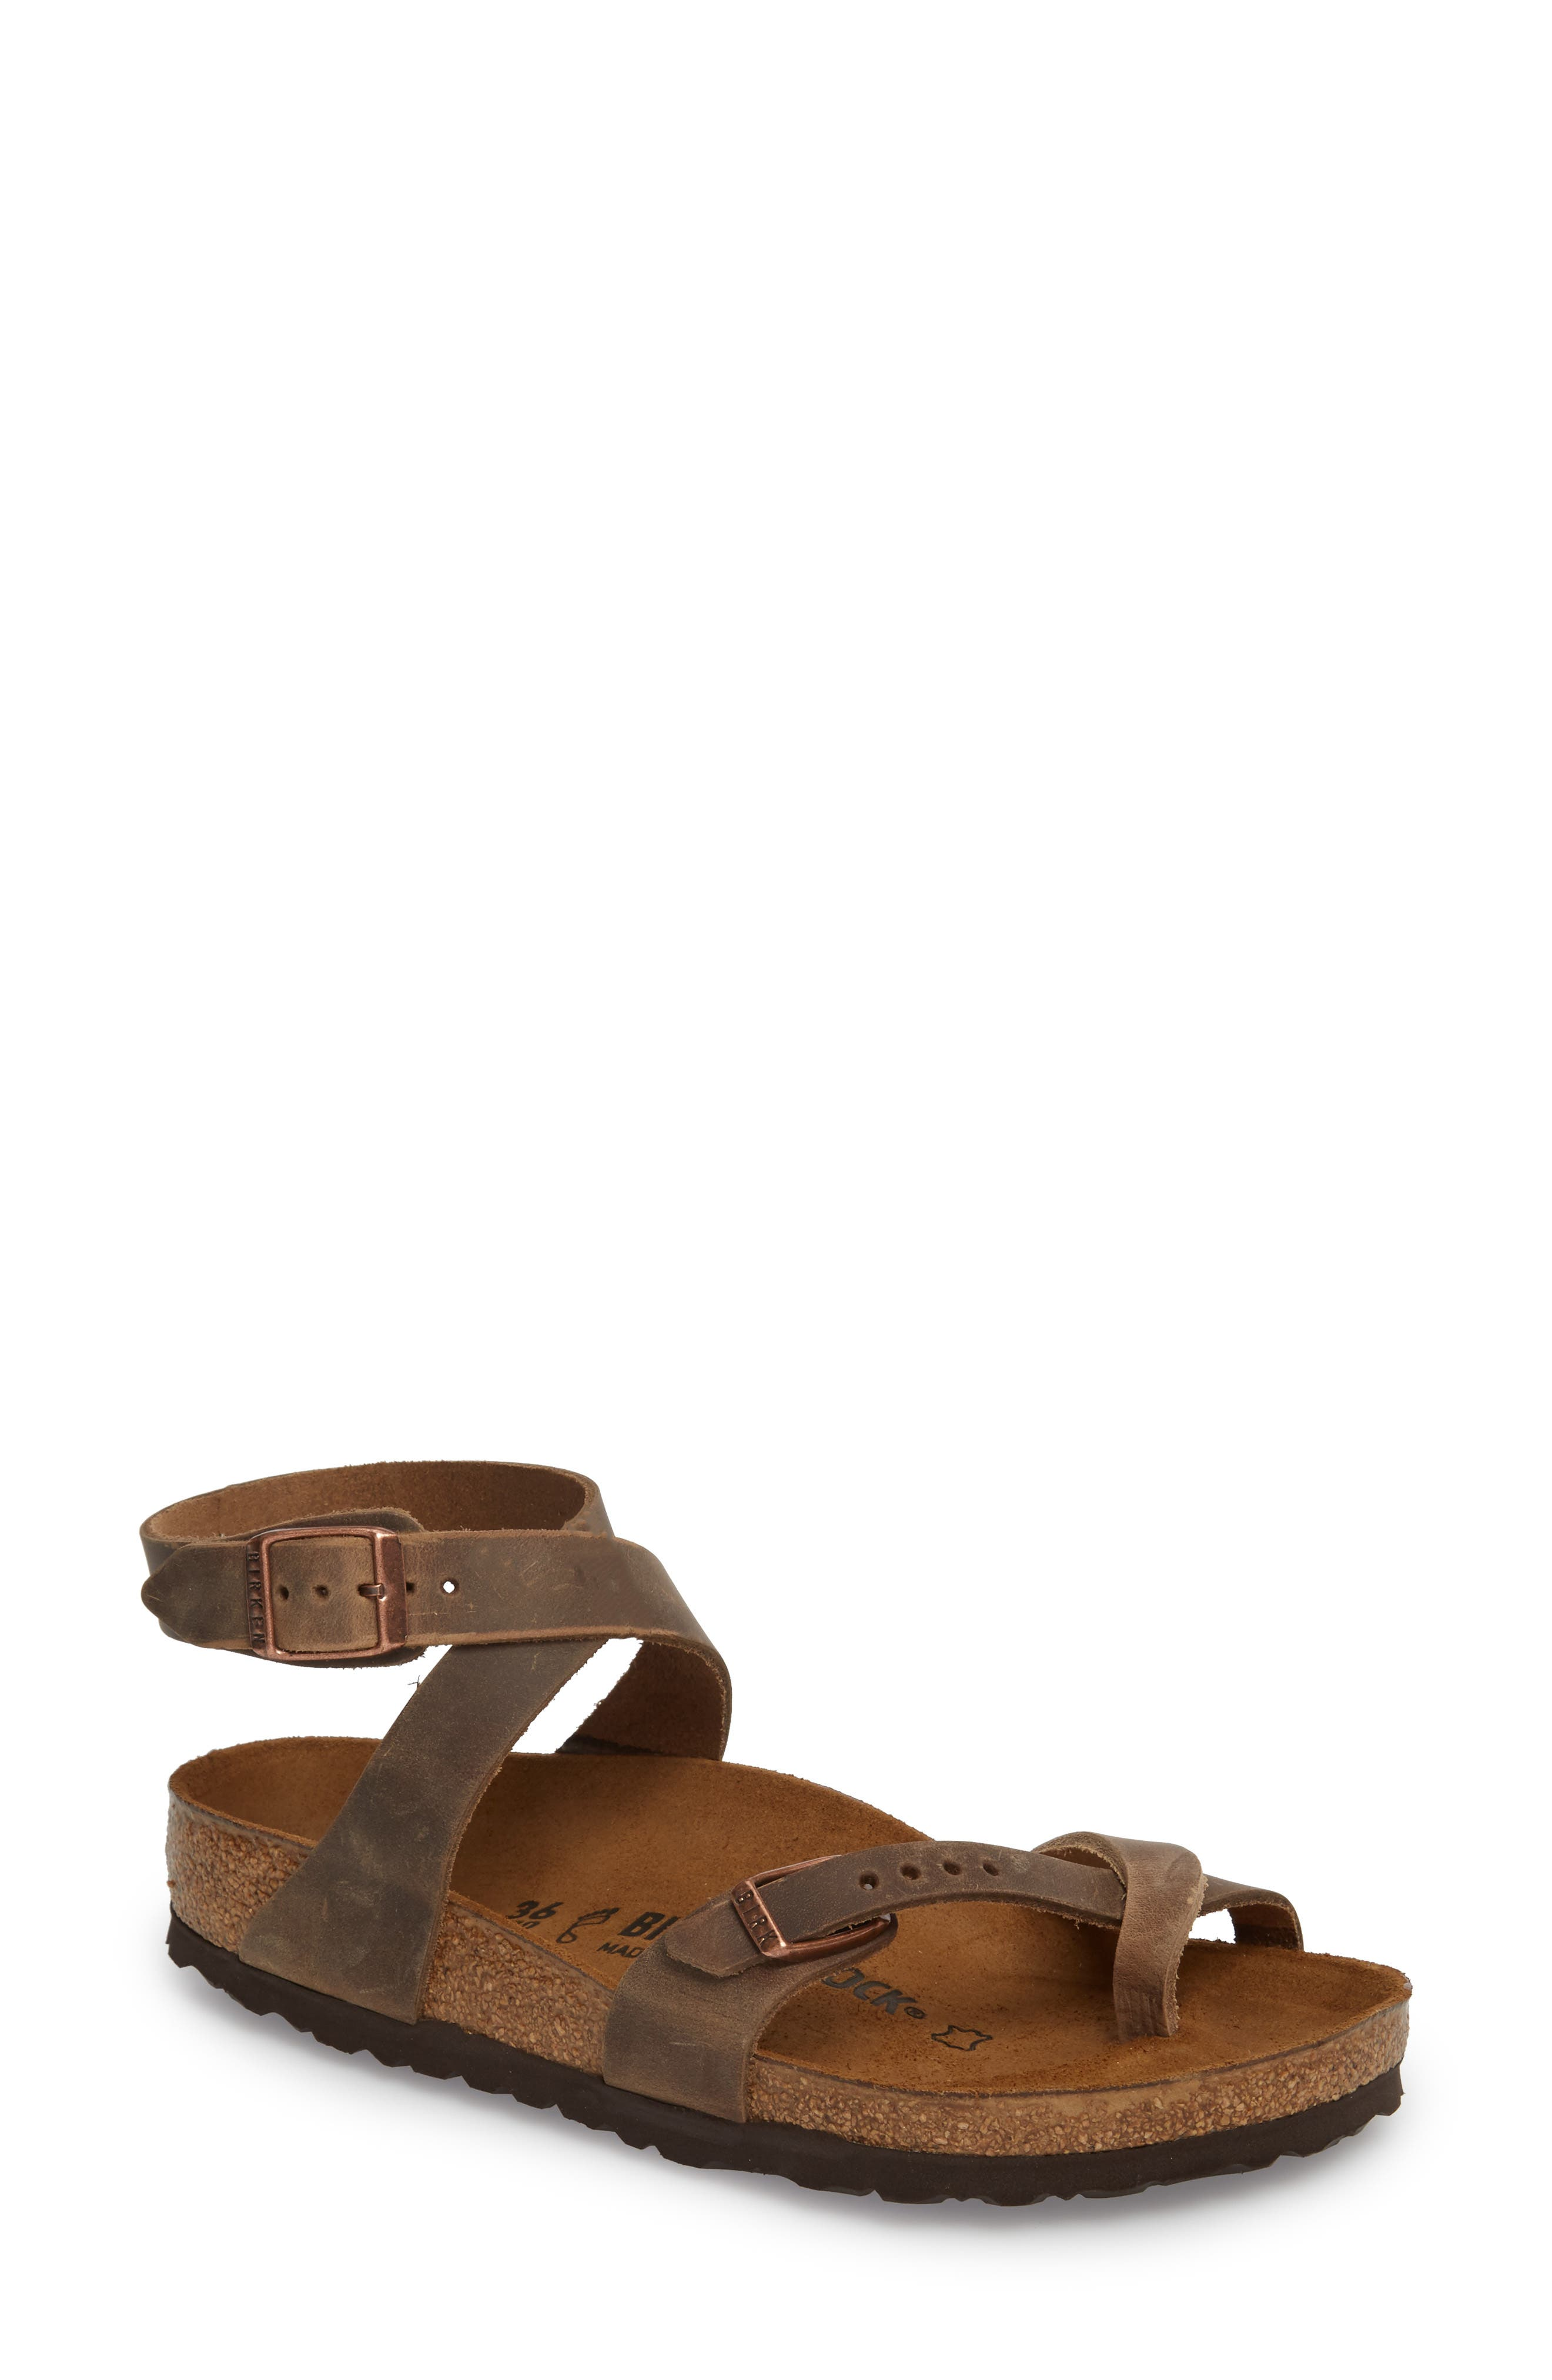 Alternate Image 1 Selected - Birkenstock 'Yara' Sandal (Women)